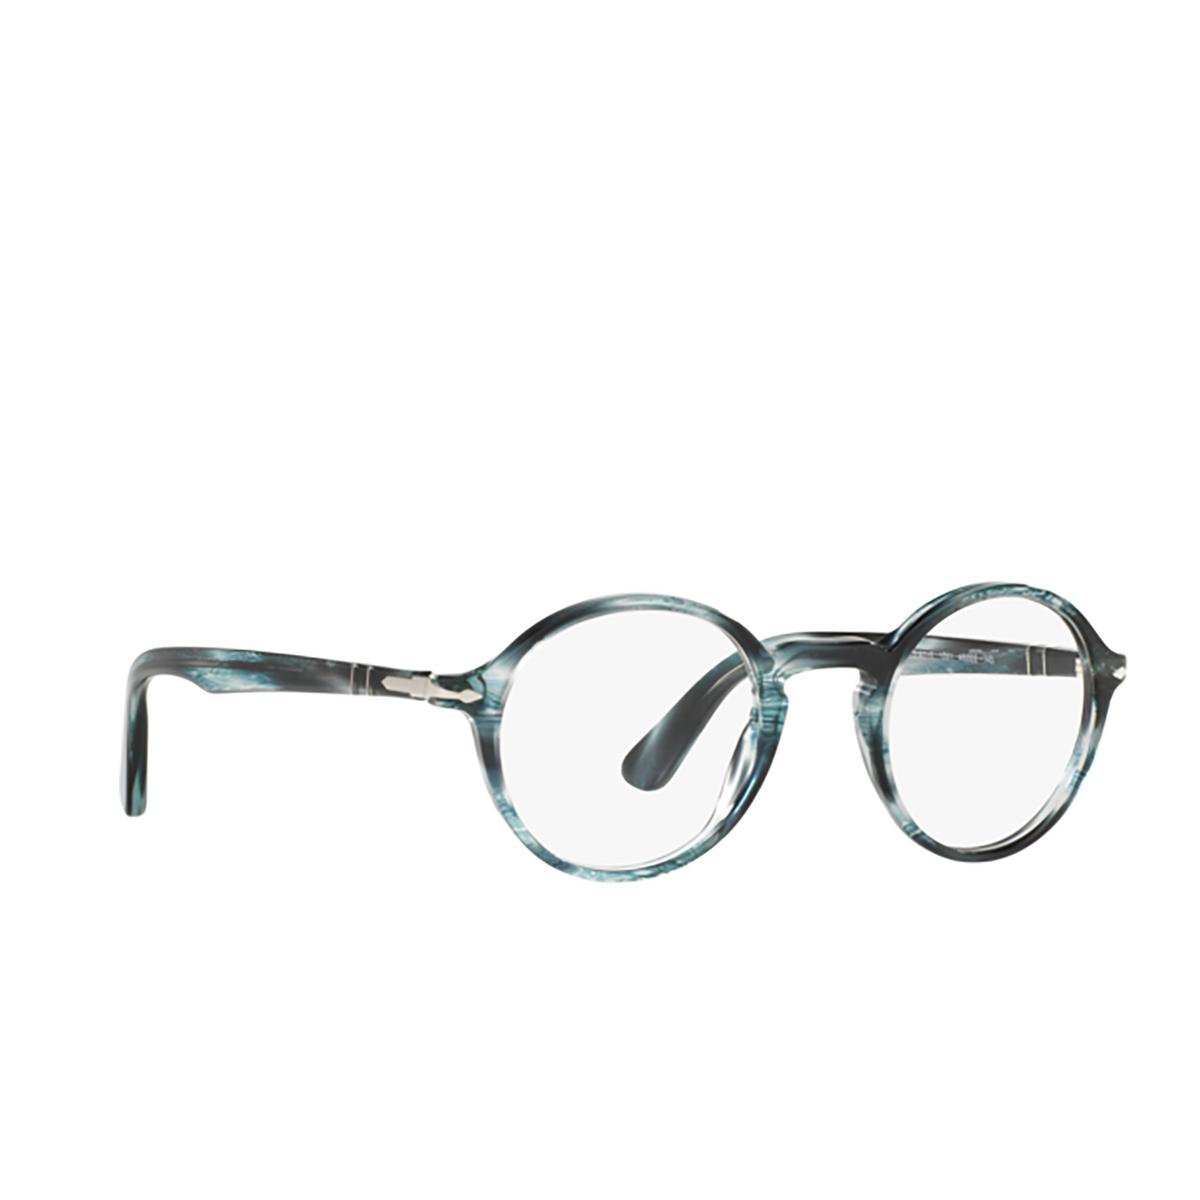 Persol® Round Eyeglasses: PO3141V color Striped Grey 1051 - three-quarters view.